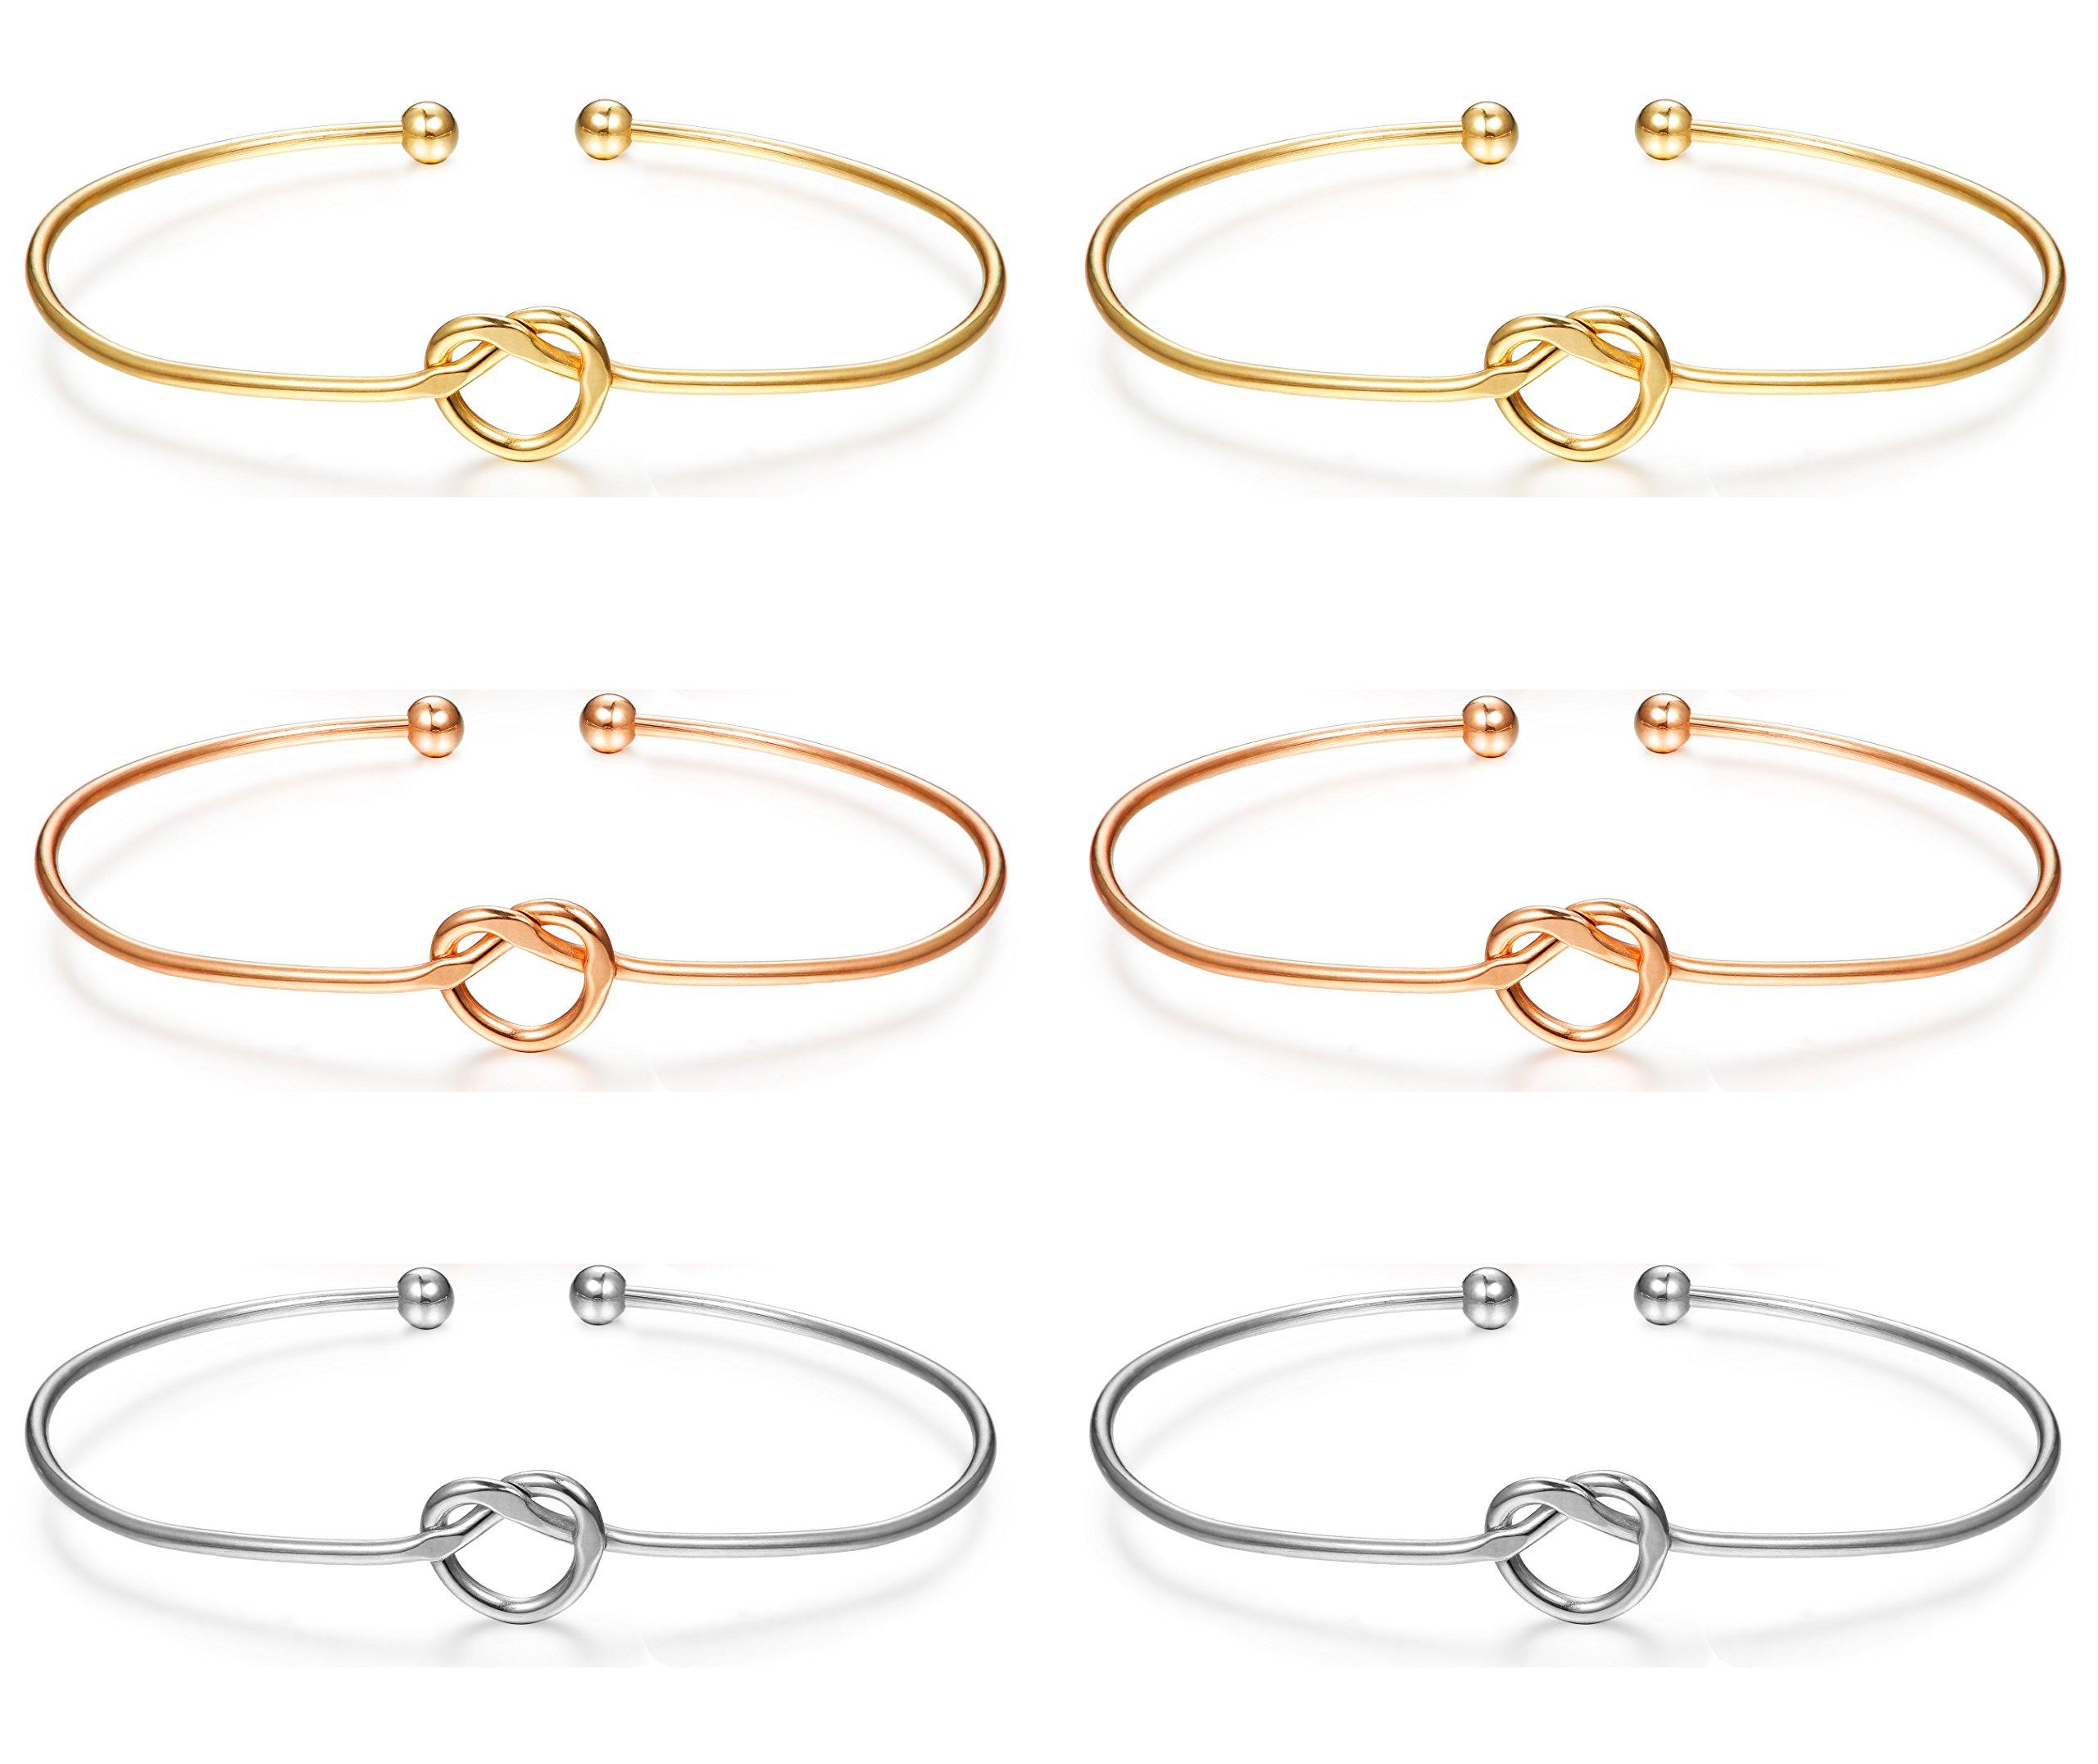 LOLIAS 6 Pcs Love Knot Bangle Bracelets Simple Cuffs Bracelets for Women Girls Stretch Bracelets Adjustable Silver-tone,Gold-tone,Rose Gold-tone